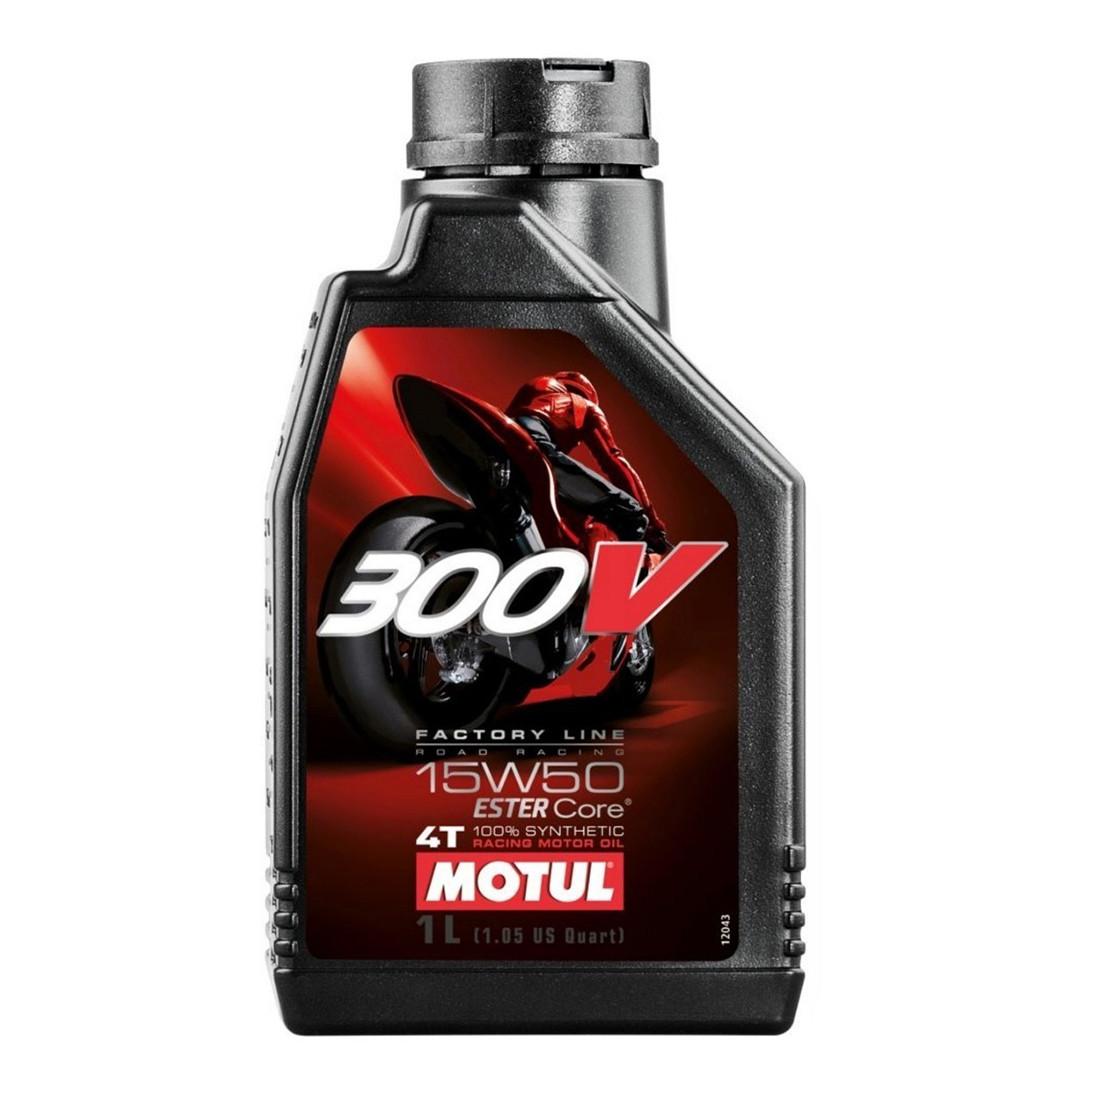 Aceite Motul 300V 15W50 4T Factory Sintético 1 Litro